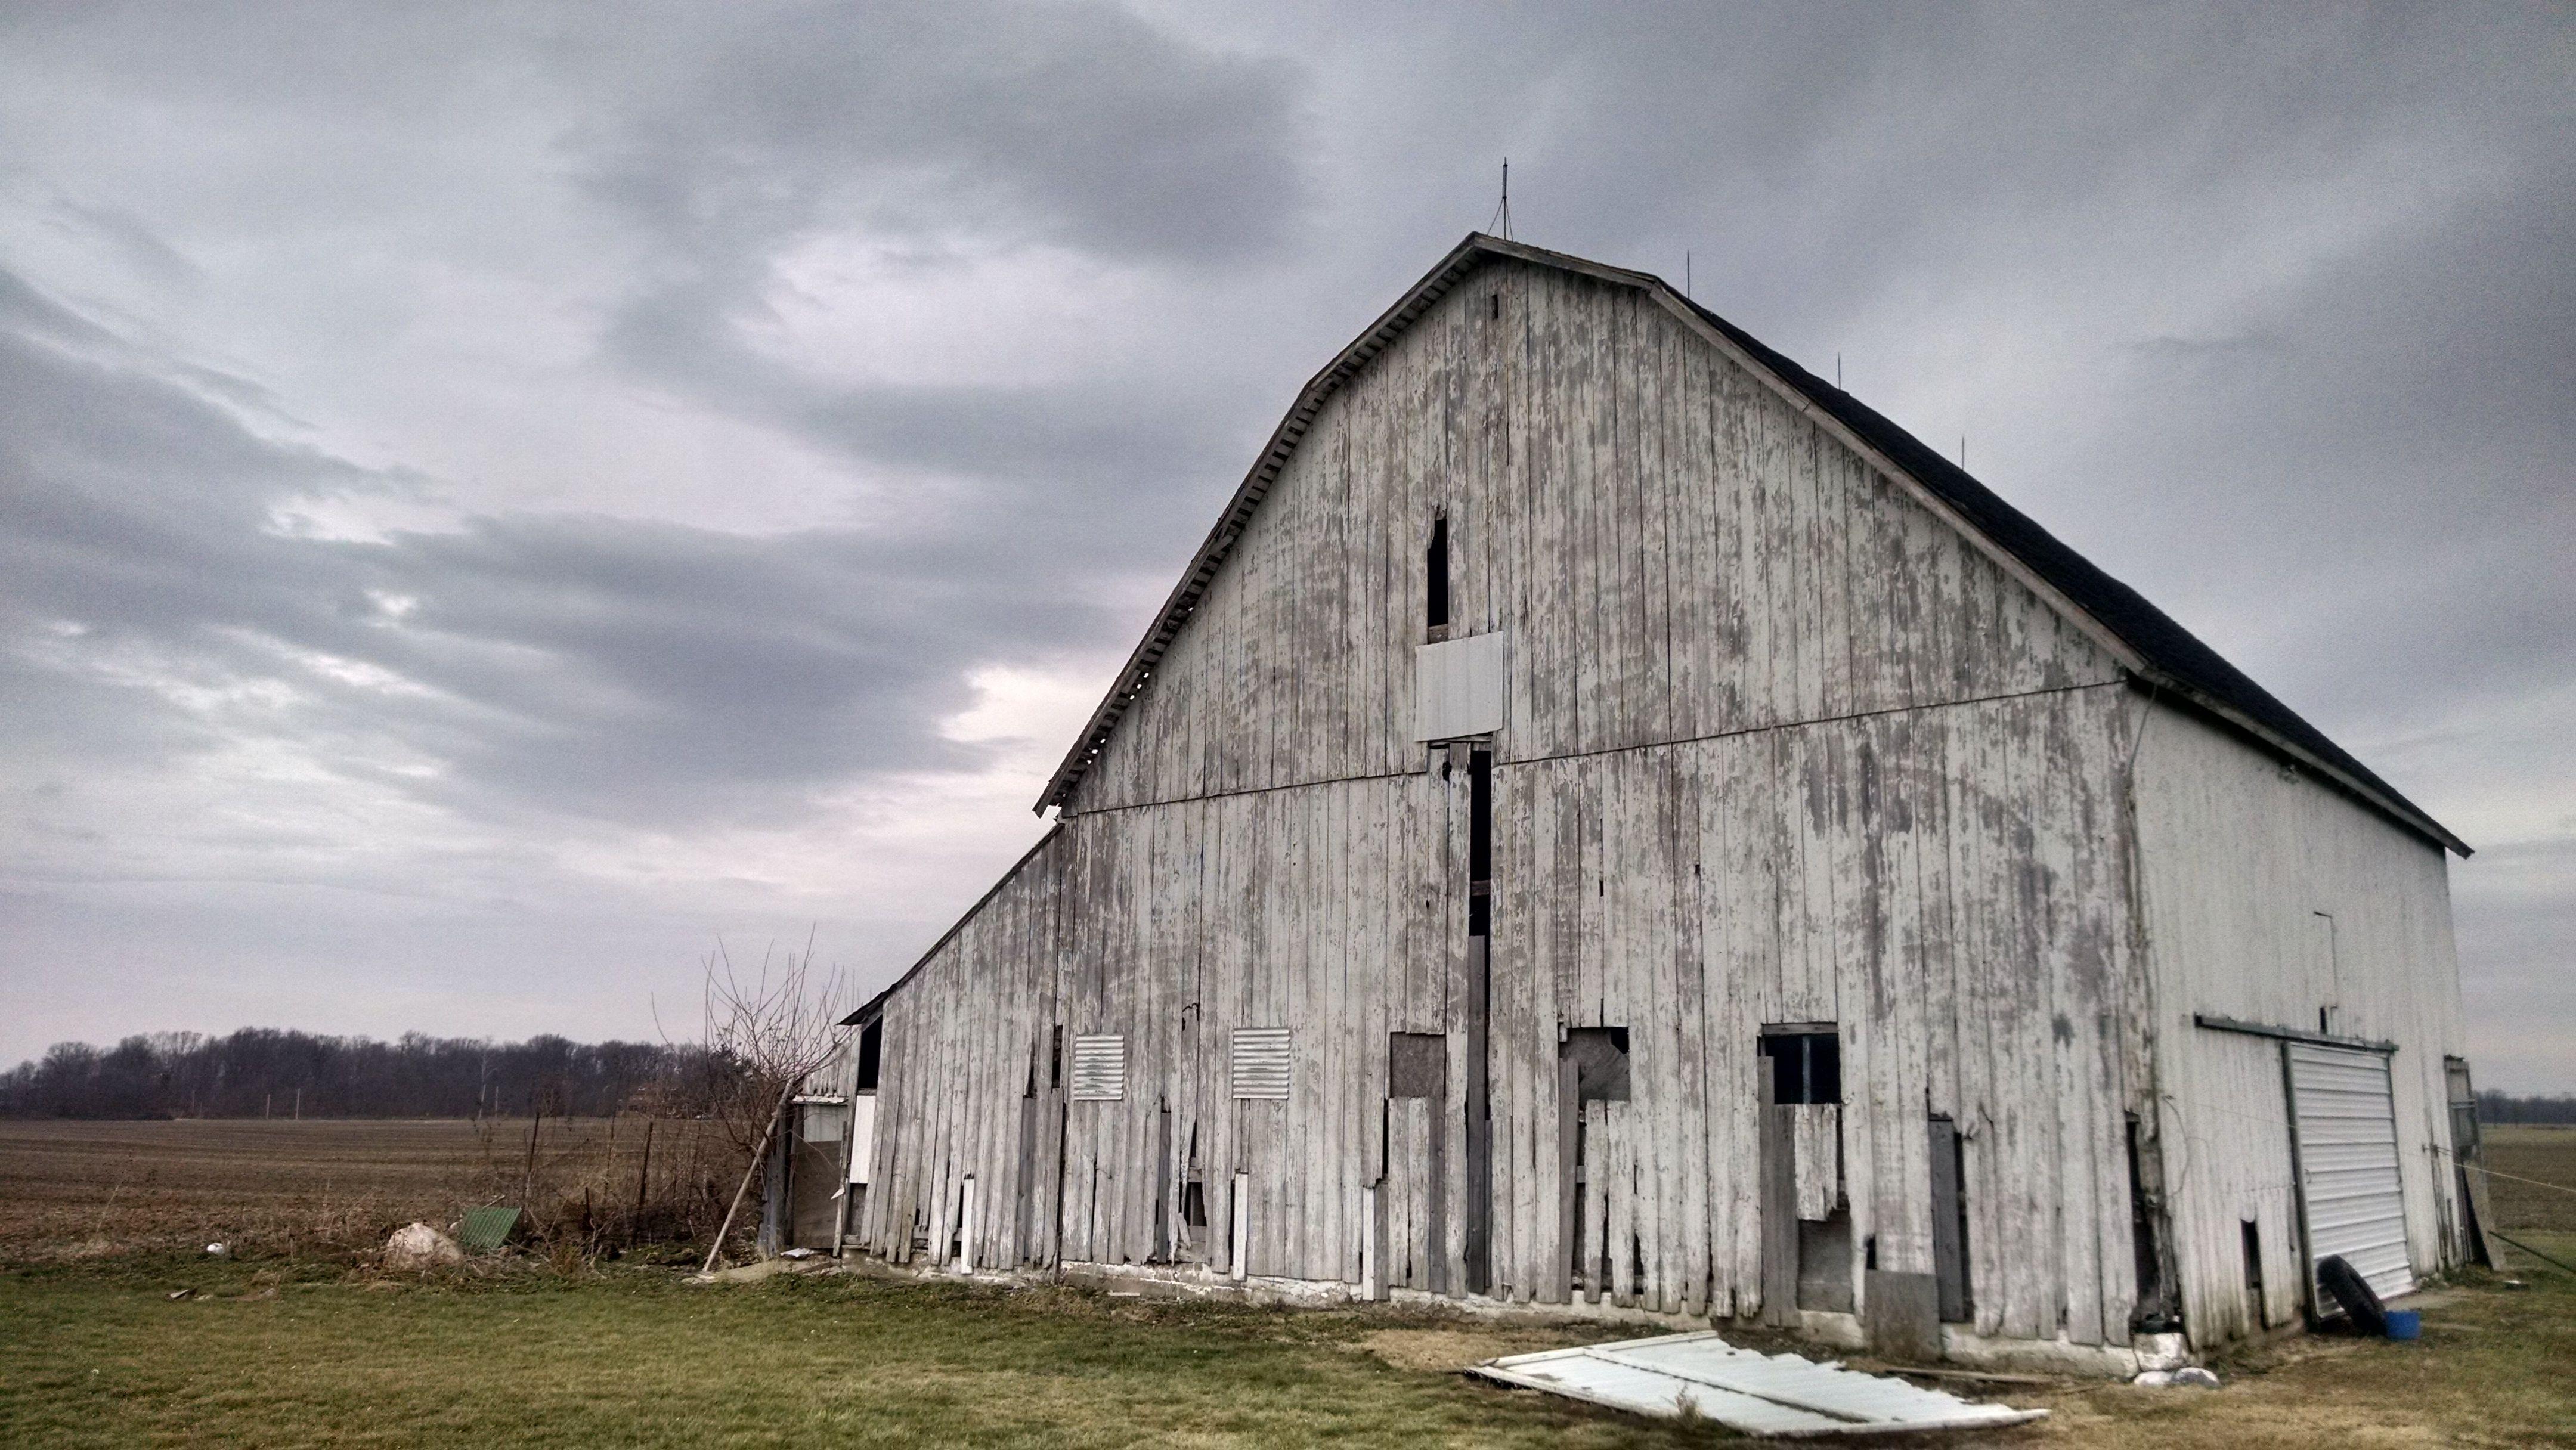 Pin by bonnie licklider on barn beauty old barns farm